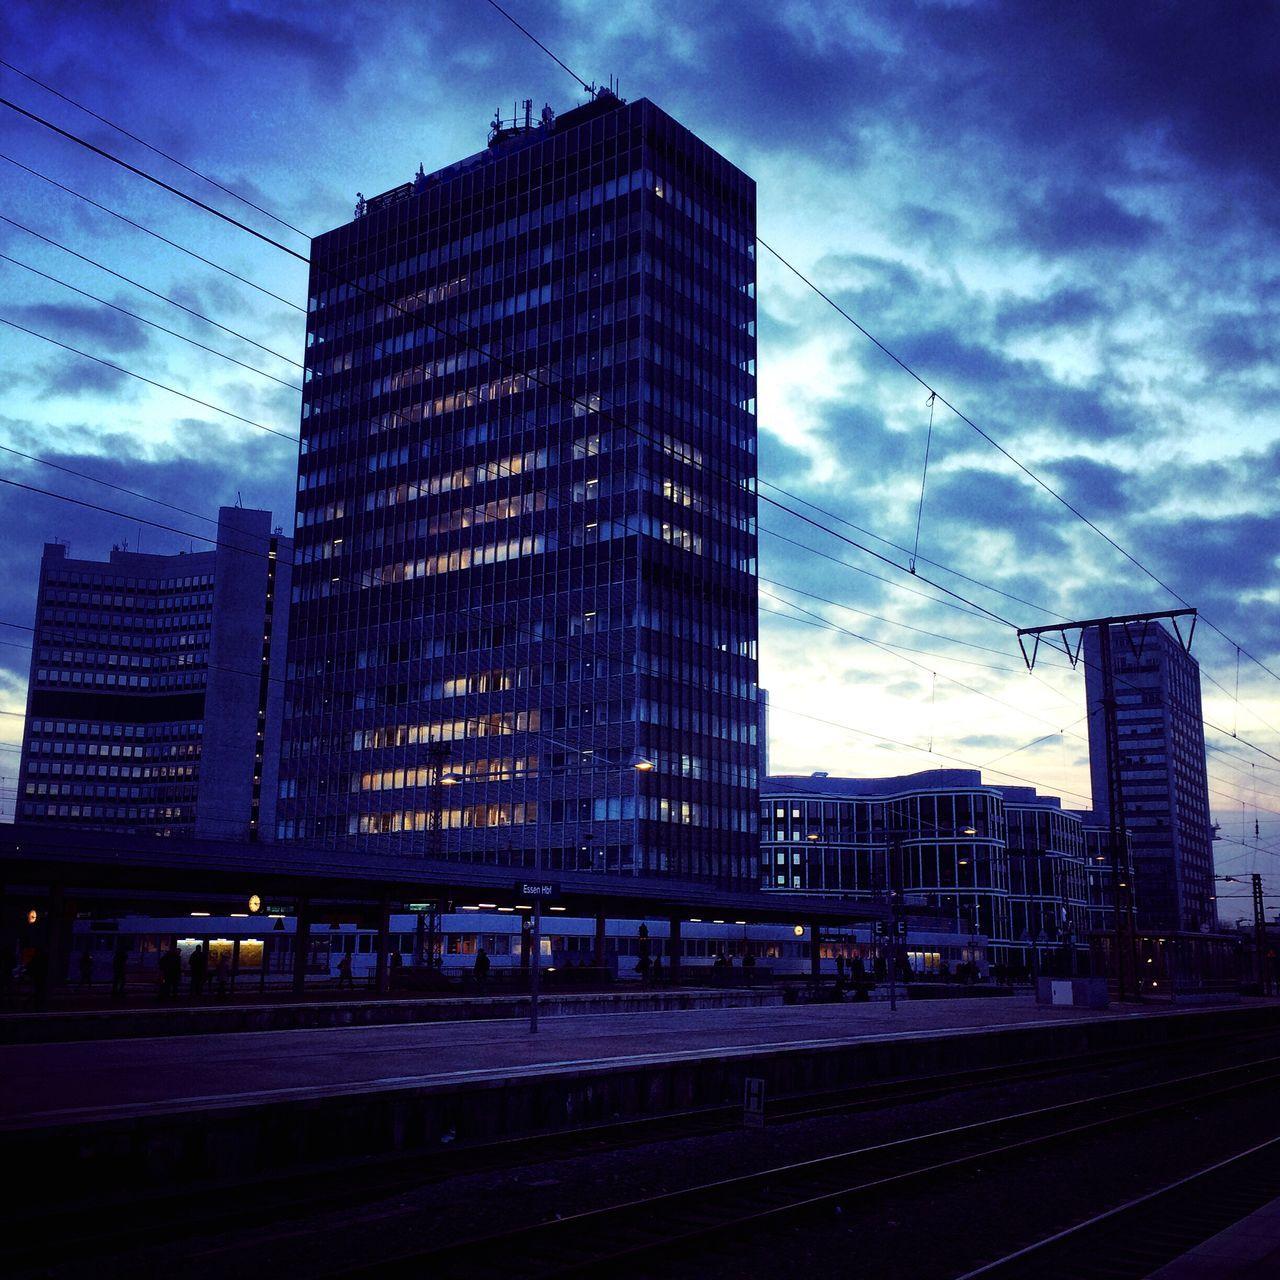 Evening mood in Essen First Eyeem Photo Domestic Terminal